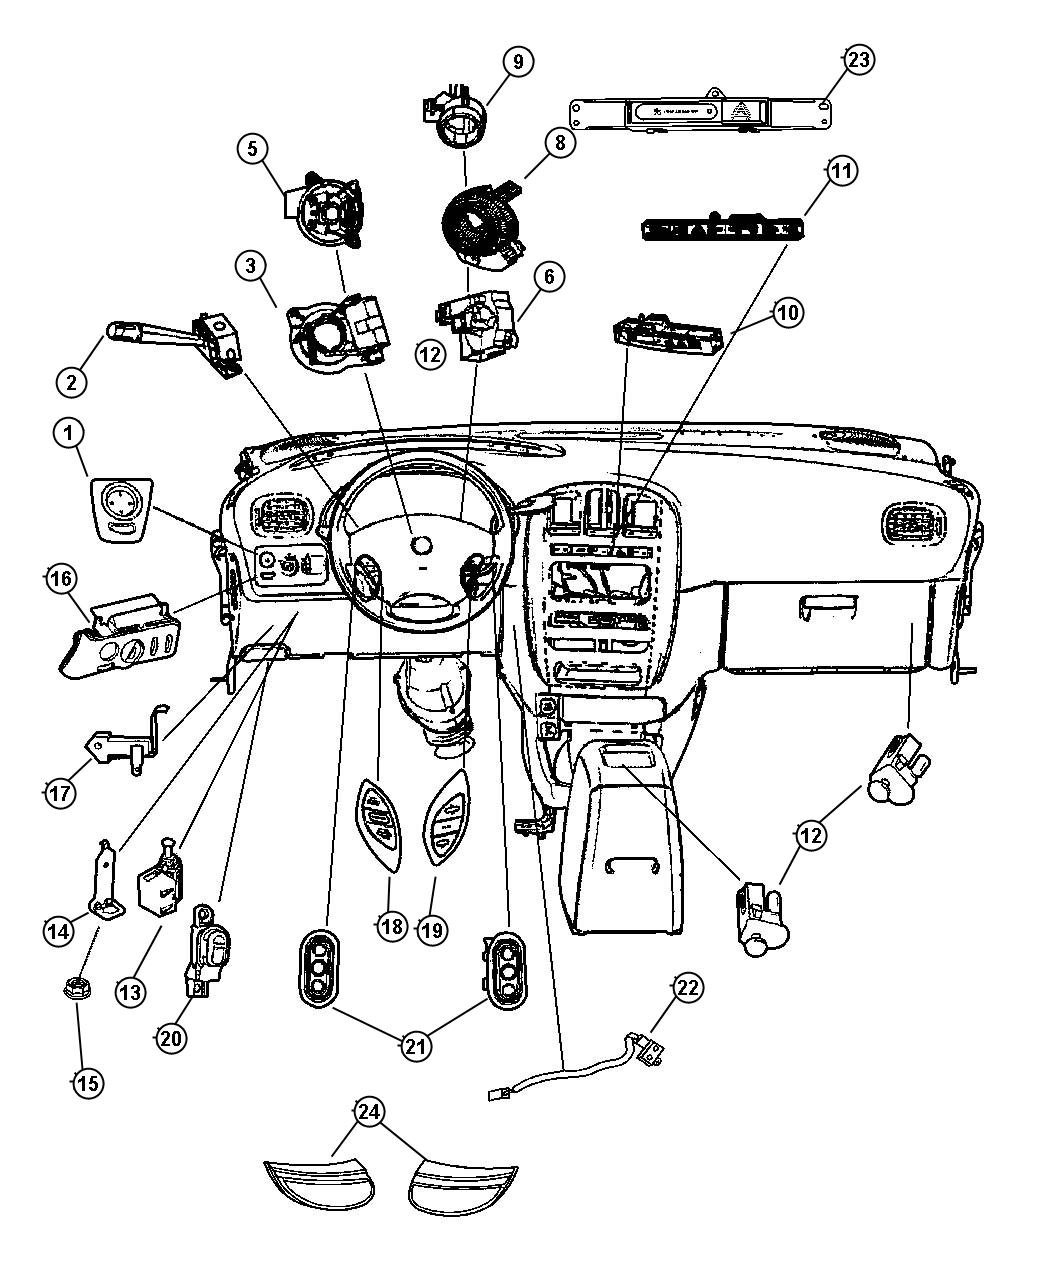 Dodge Grand Caravan Switch Hazard Warning Front